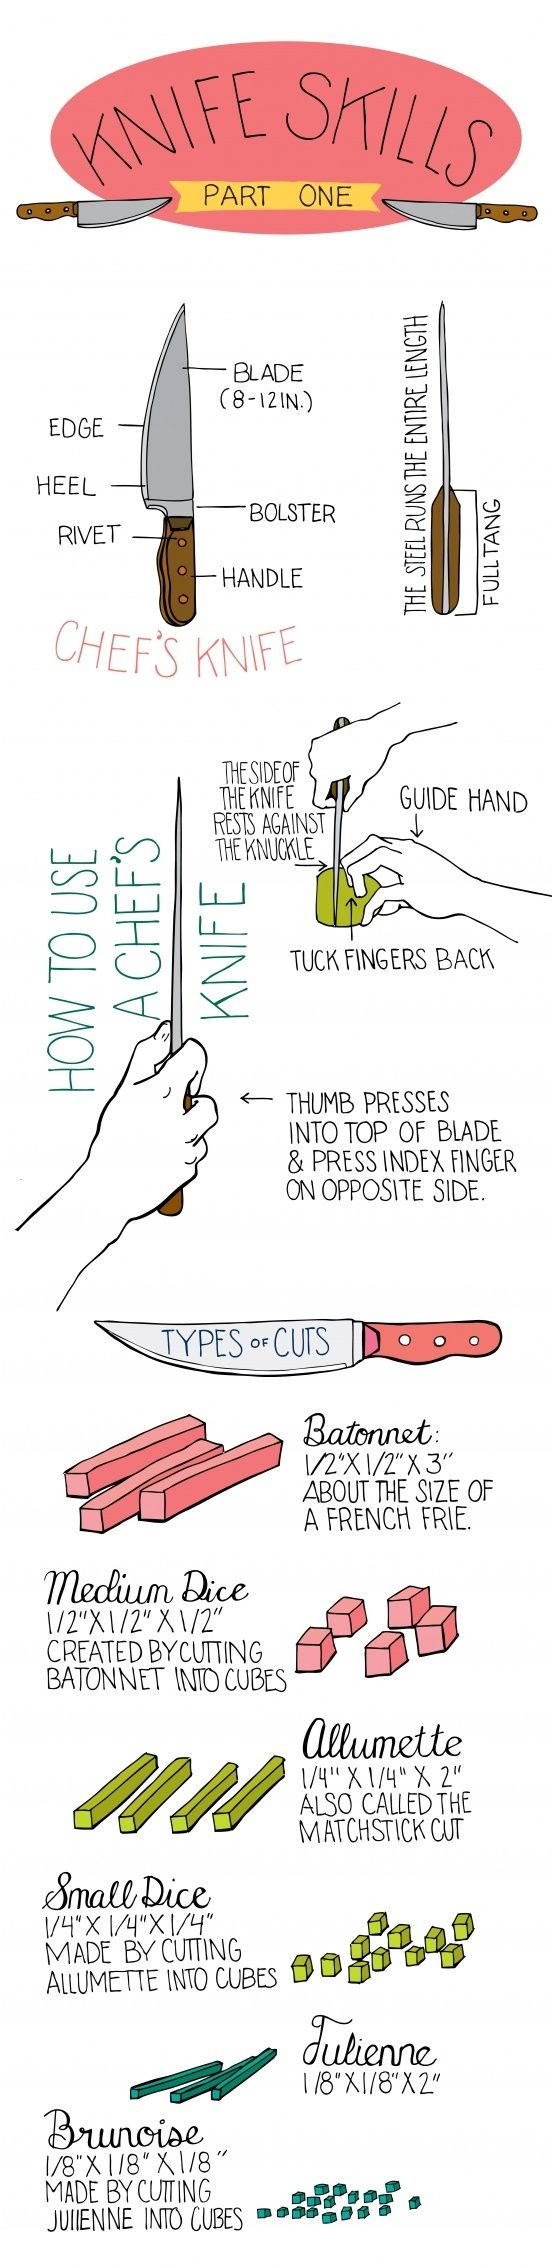 Knife skills!